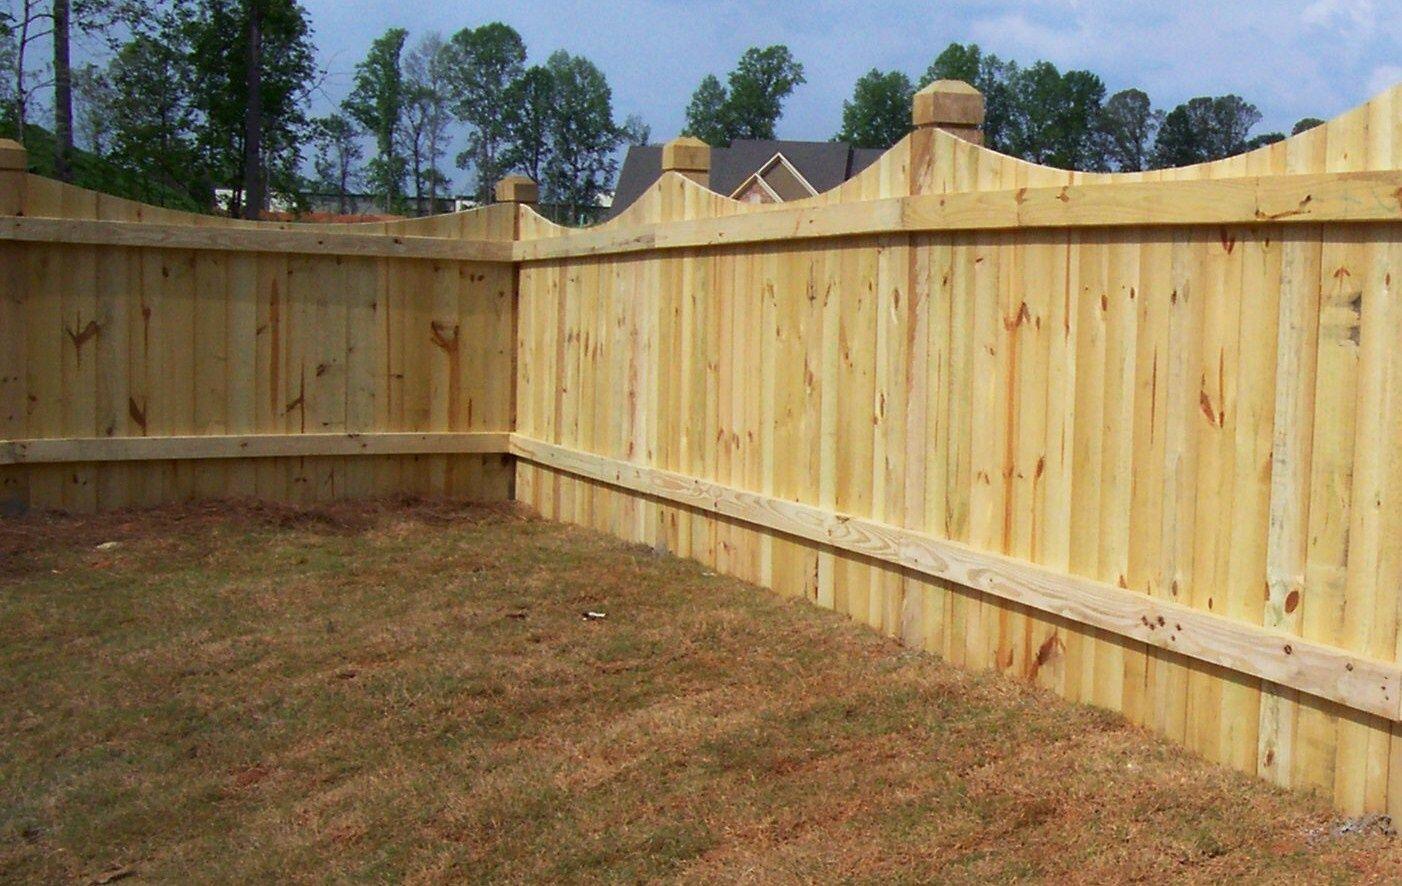 Saddle Cut Wood Fence Design Mossy Oak Fence Company